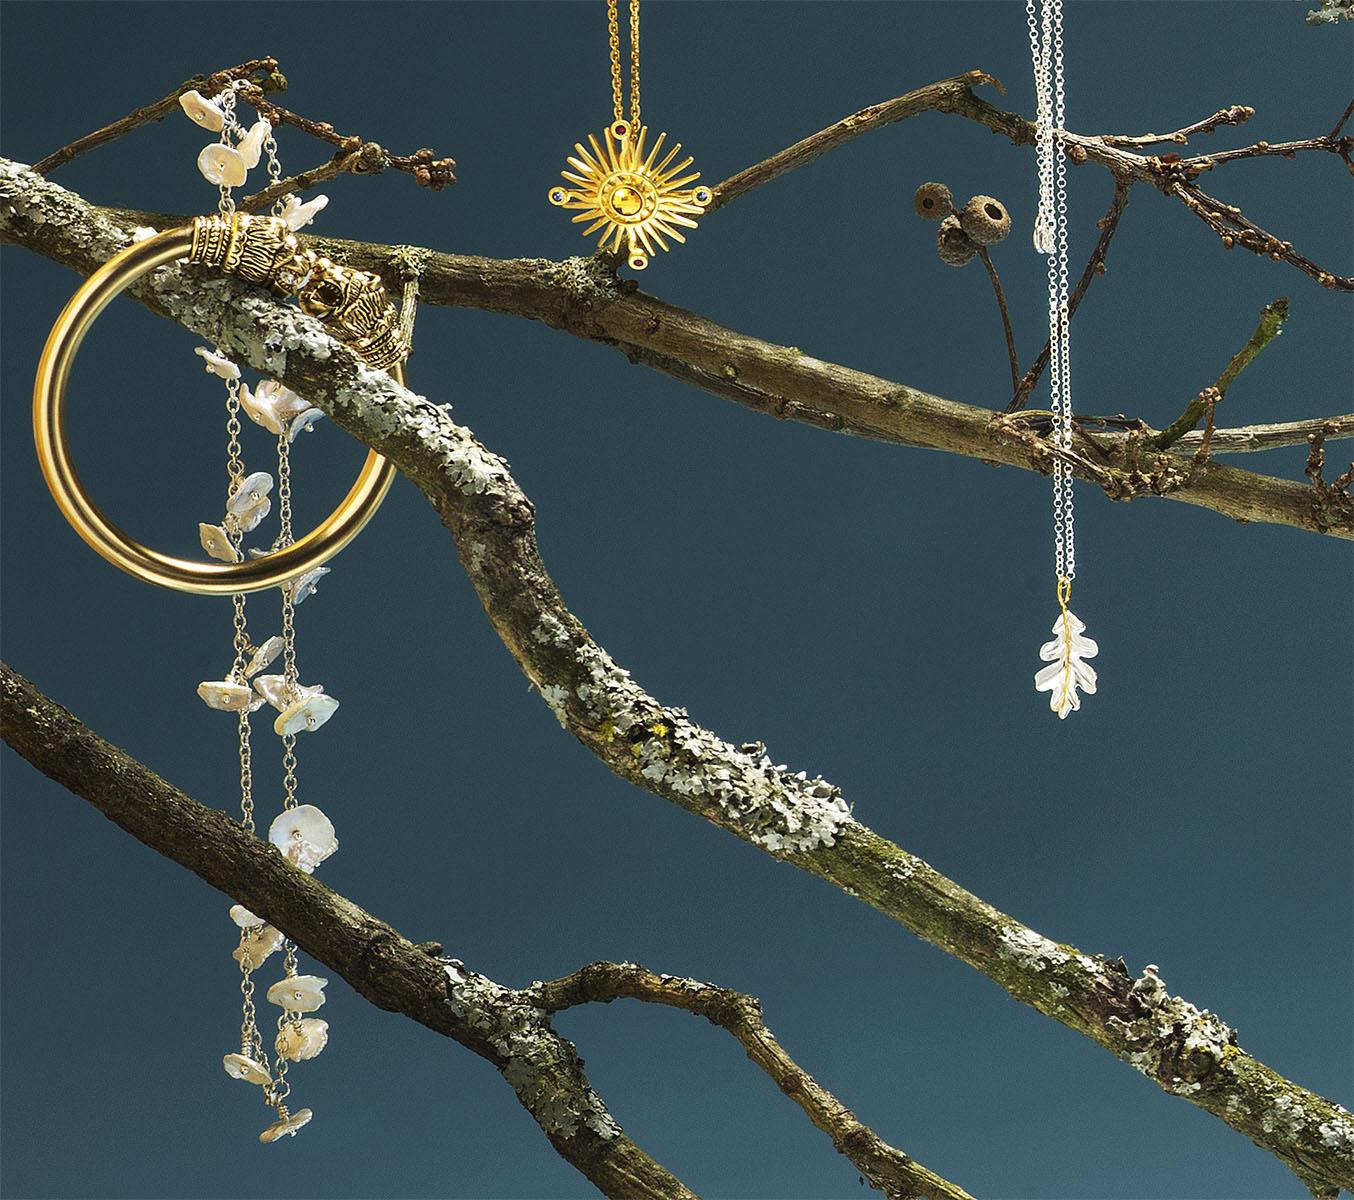 jewellery_BM3.jpg